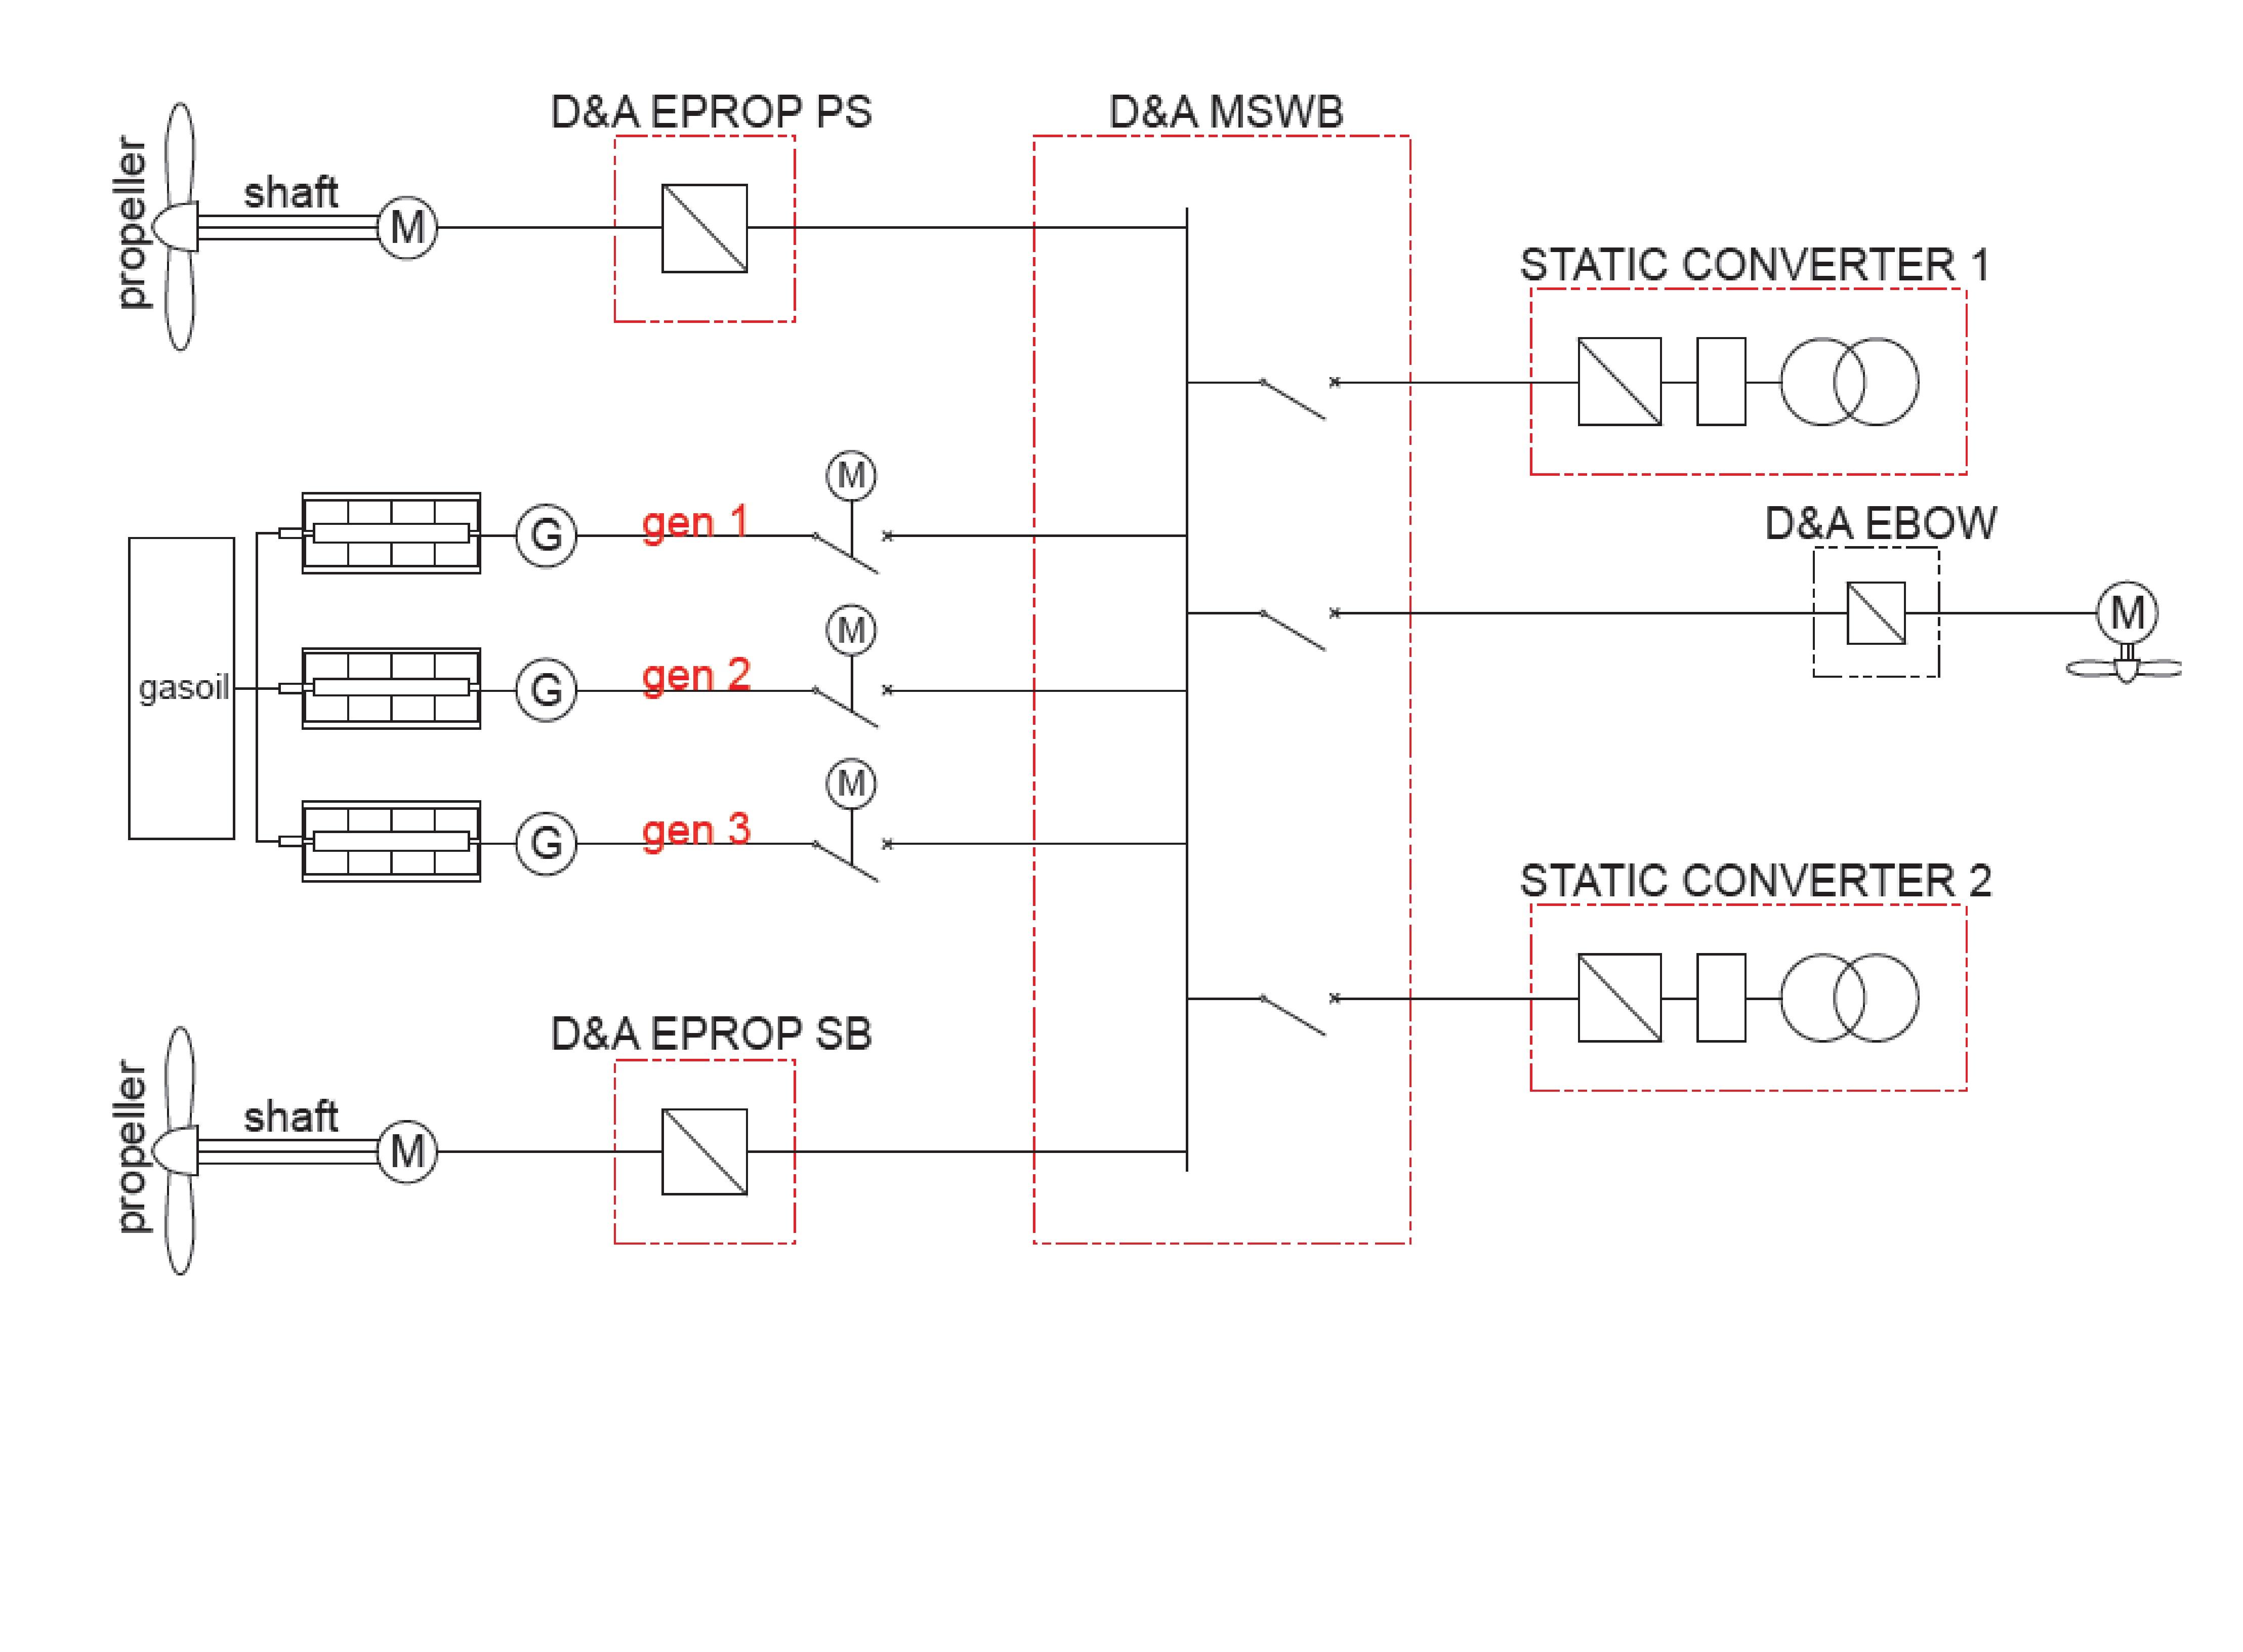 Volvo Thruster Wiring Diagram And Schematics Penta Engine Ships Particulars Rh Tharsis Management Nl 5 0 Parts Catalog